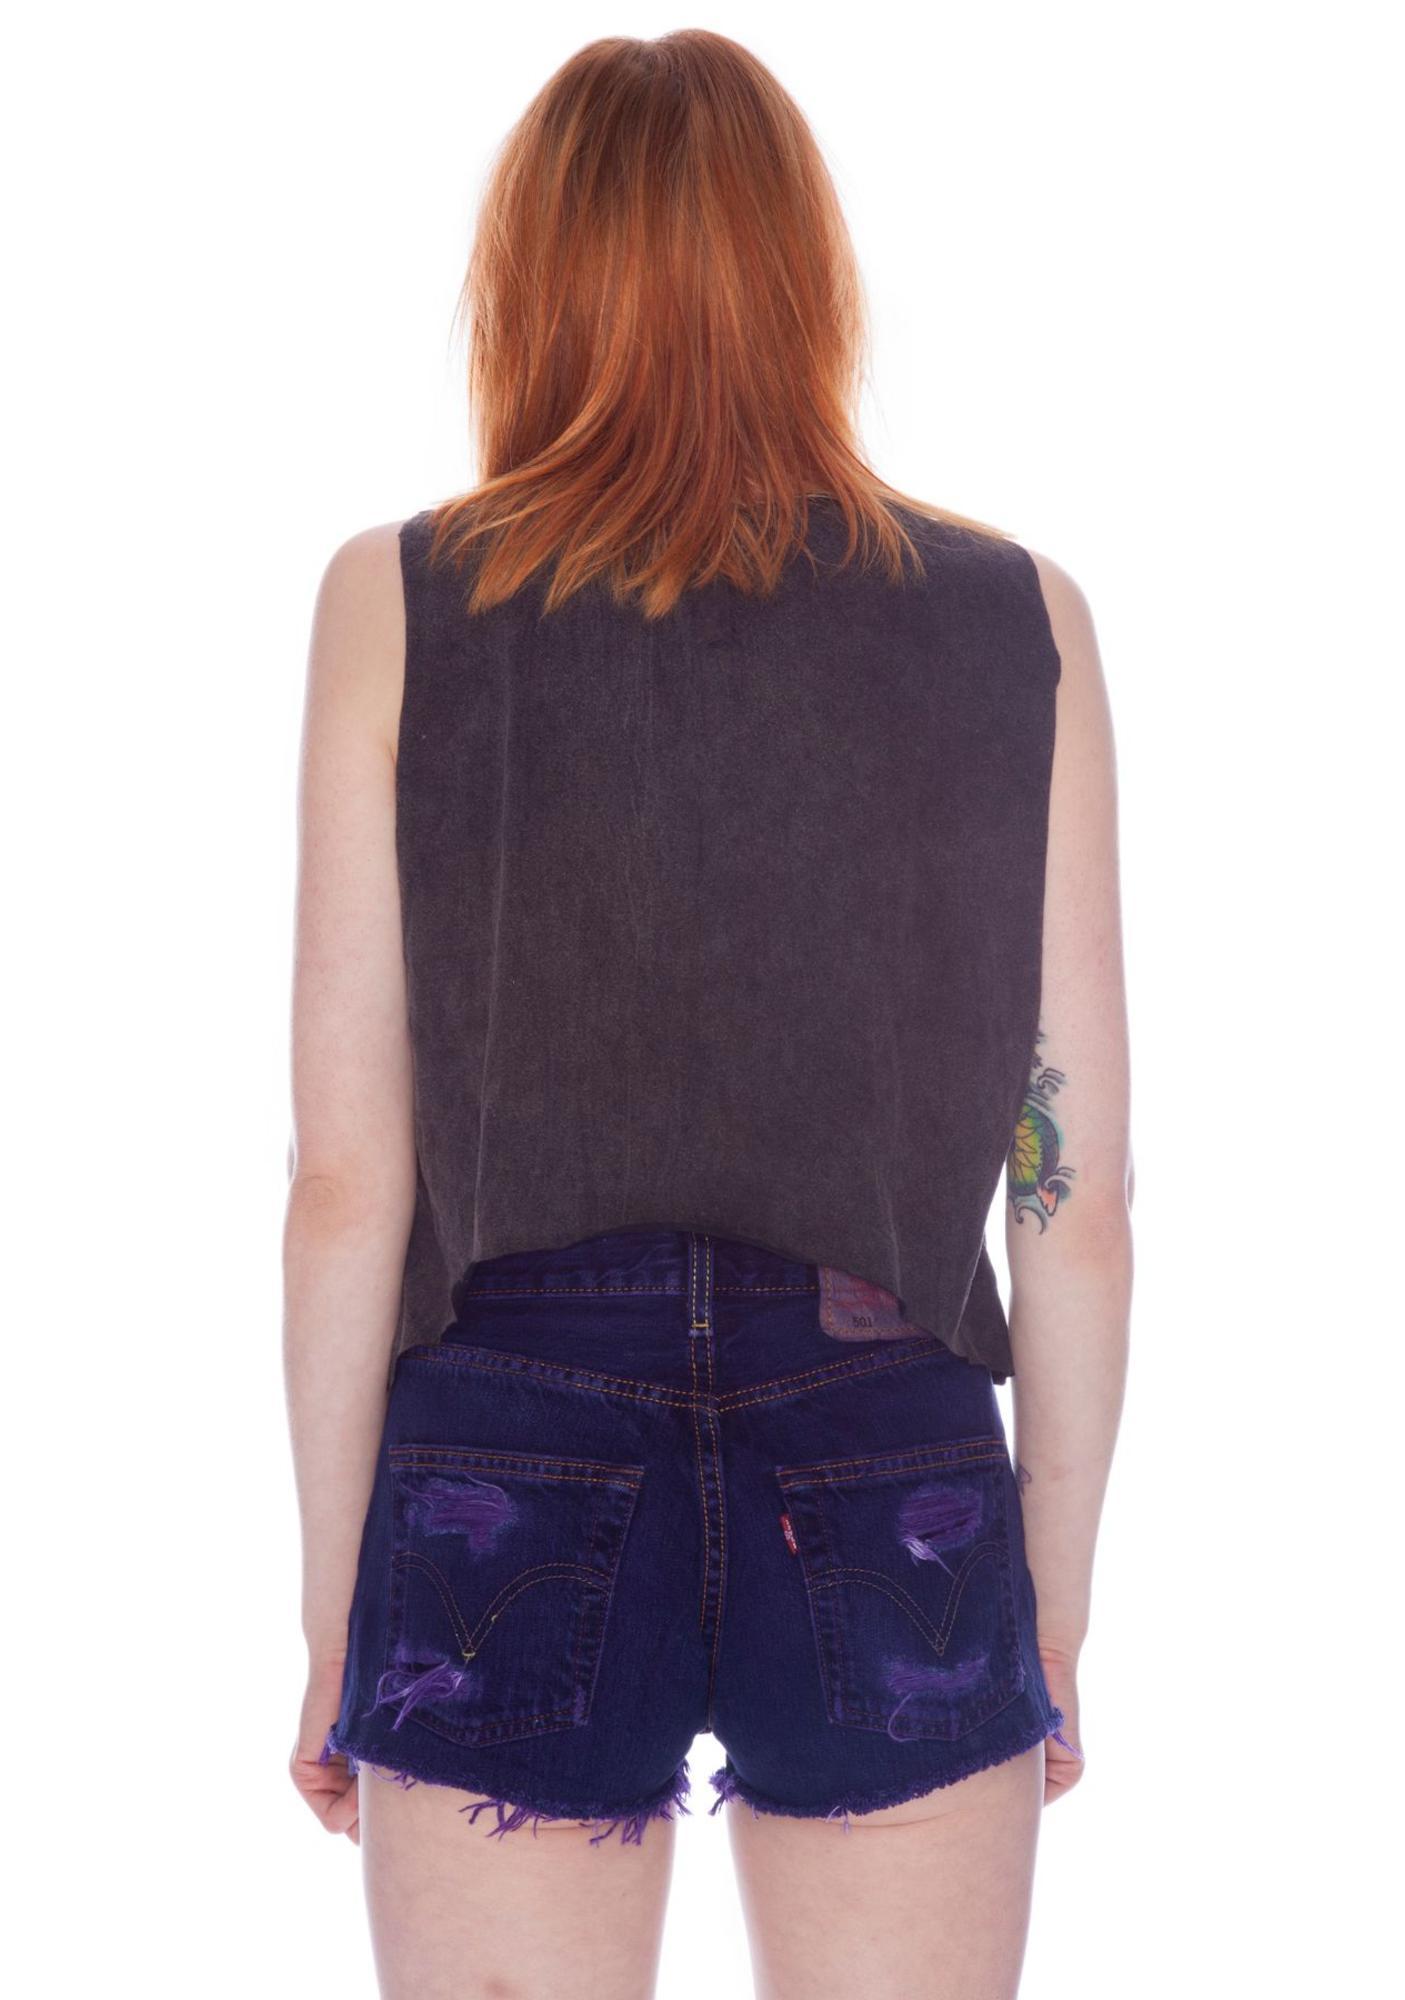 Lunar Shorts